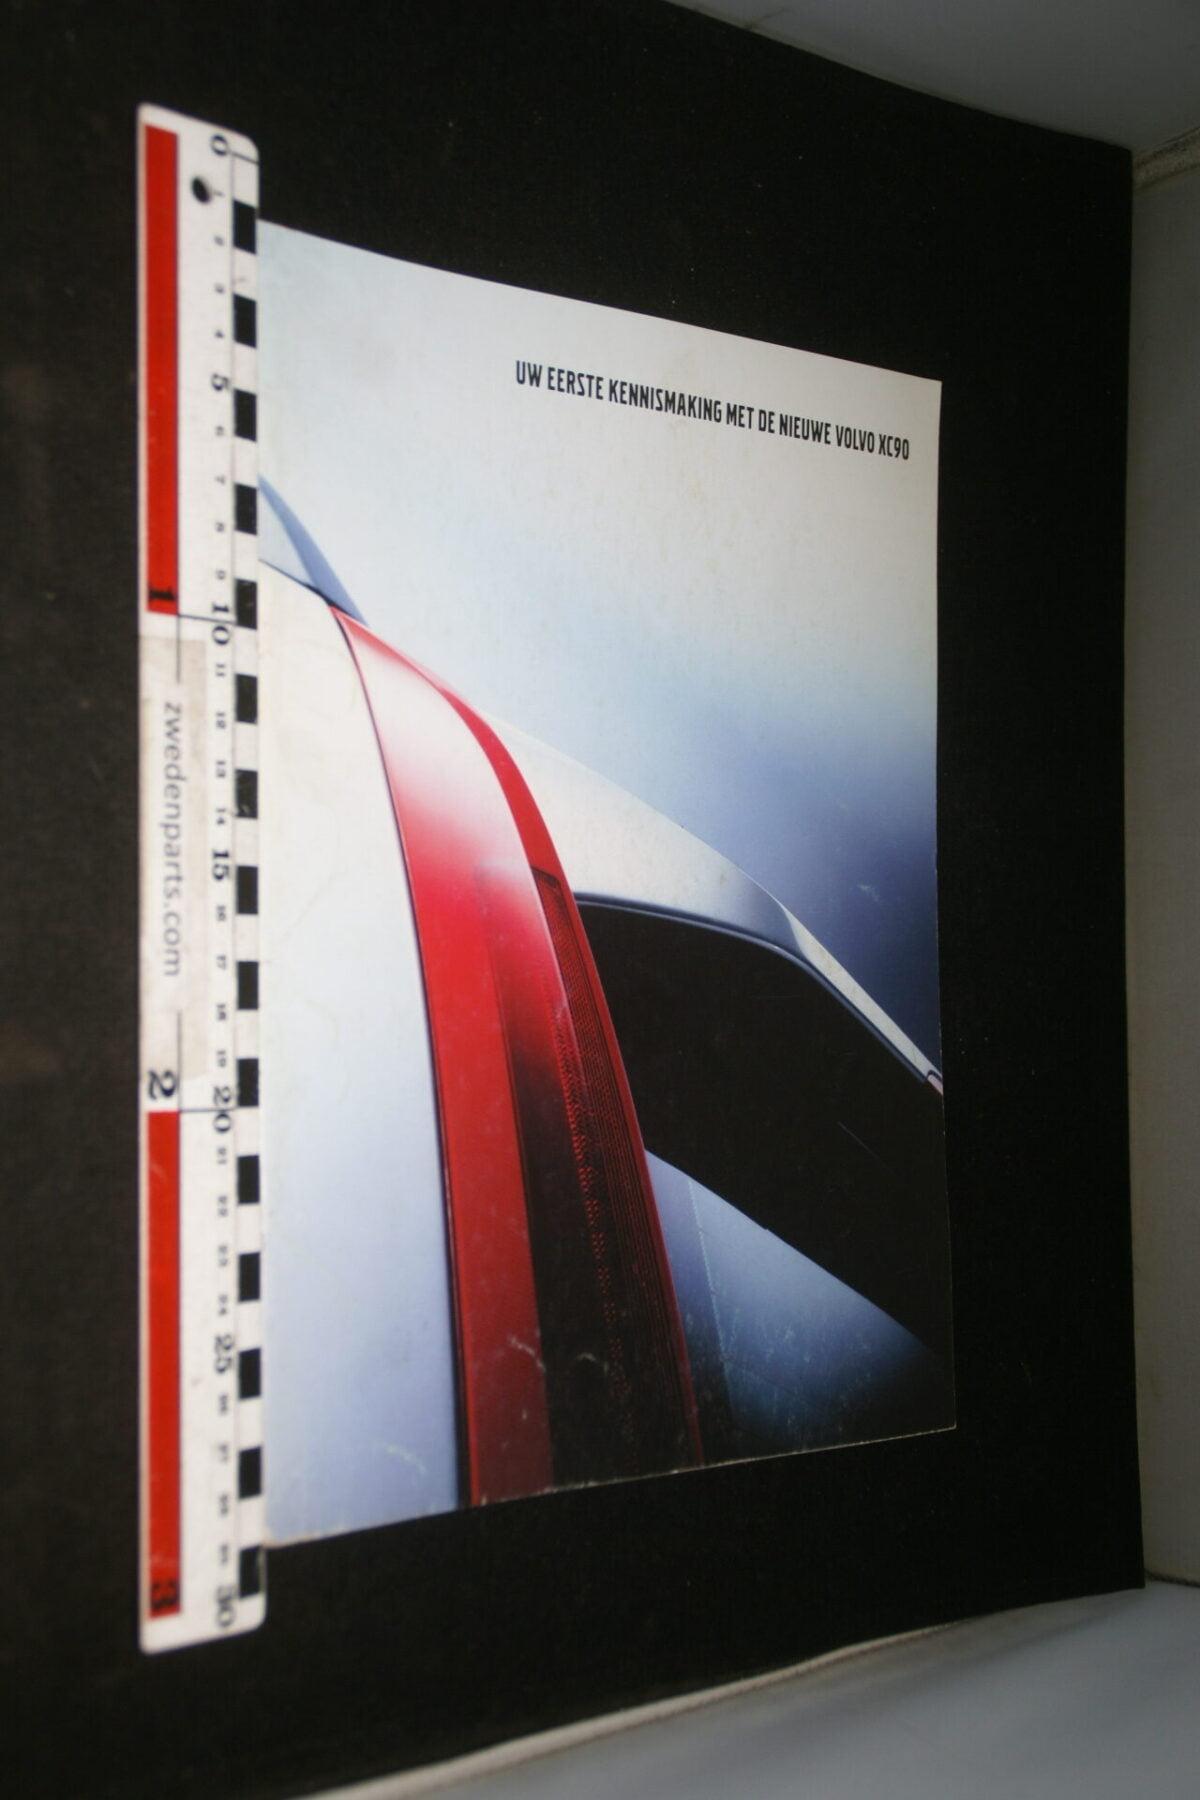 DSC04437 2002 brochure Volvo XC90 nr. 1 2002-V1-8c012099